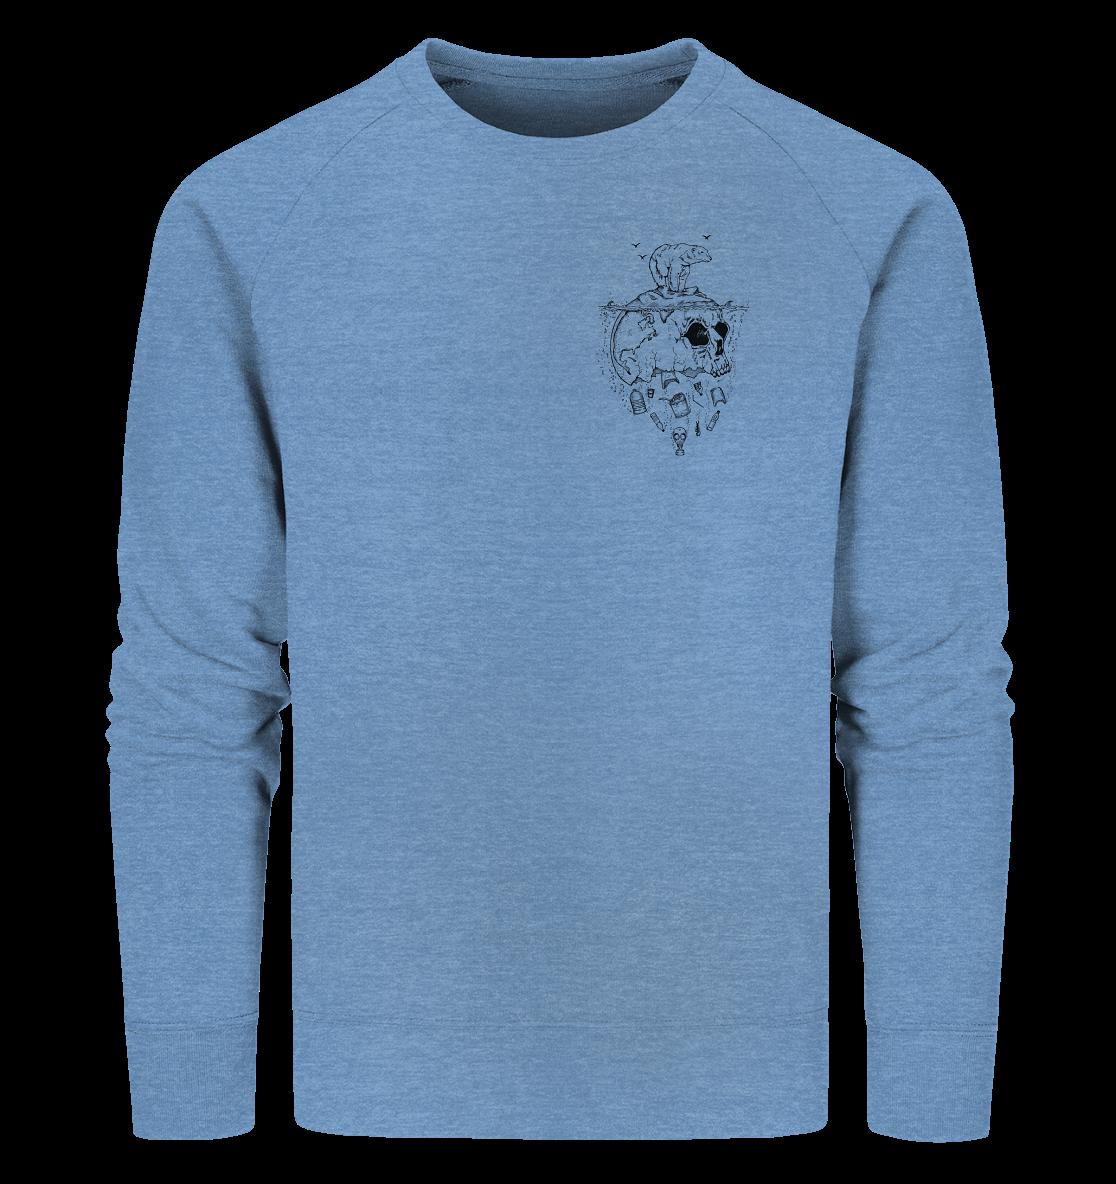 front-organic-sweatshirt-6090c4-1116x-21.png